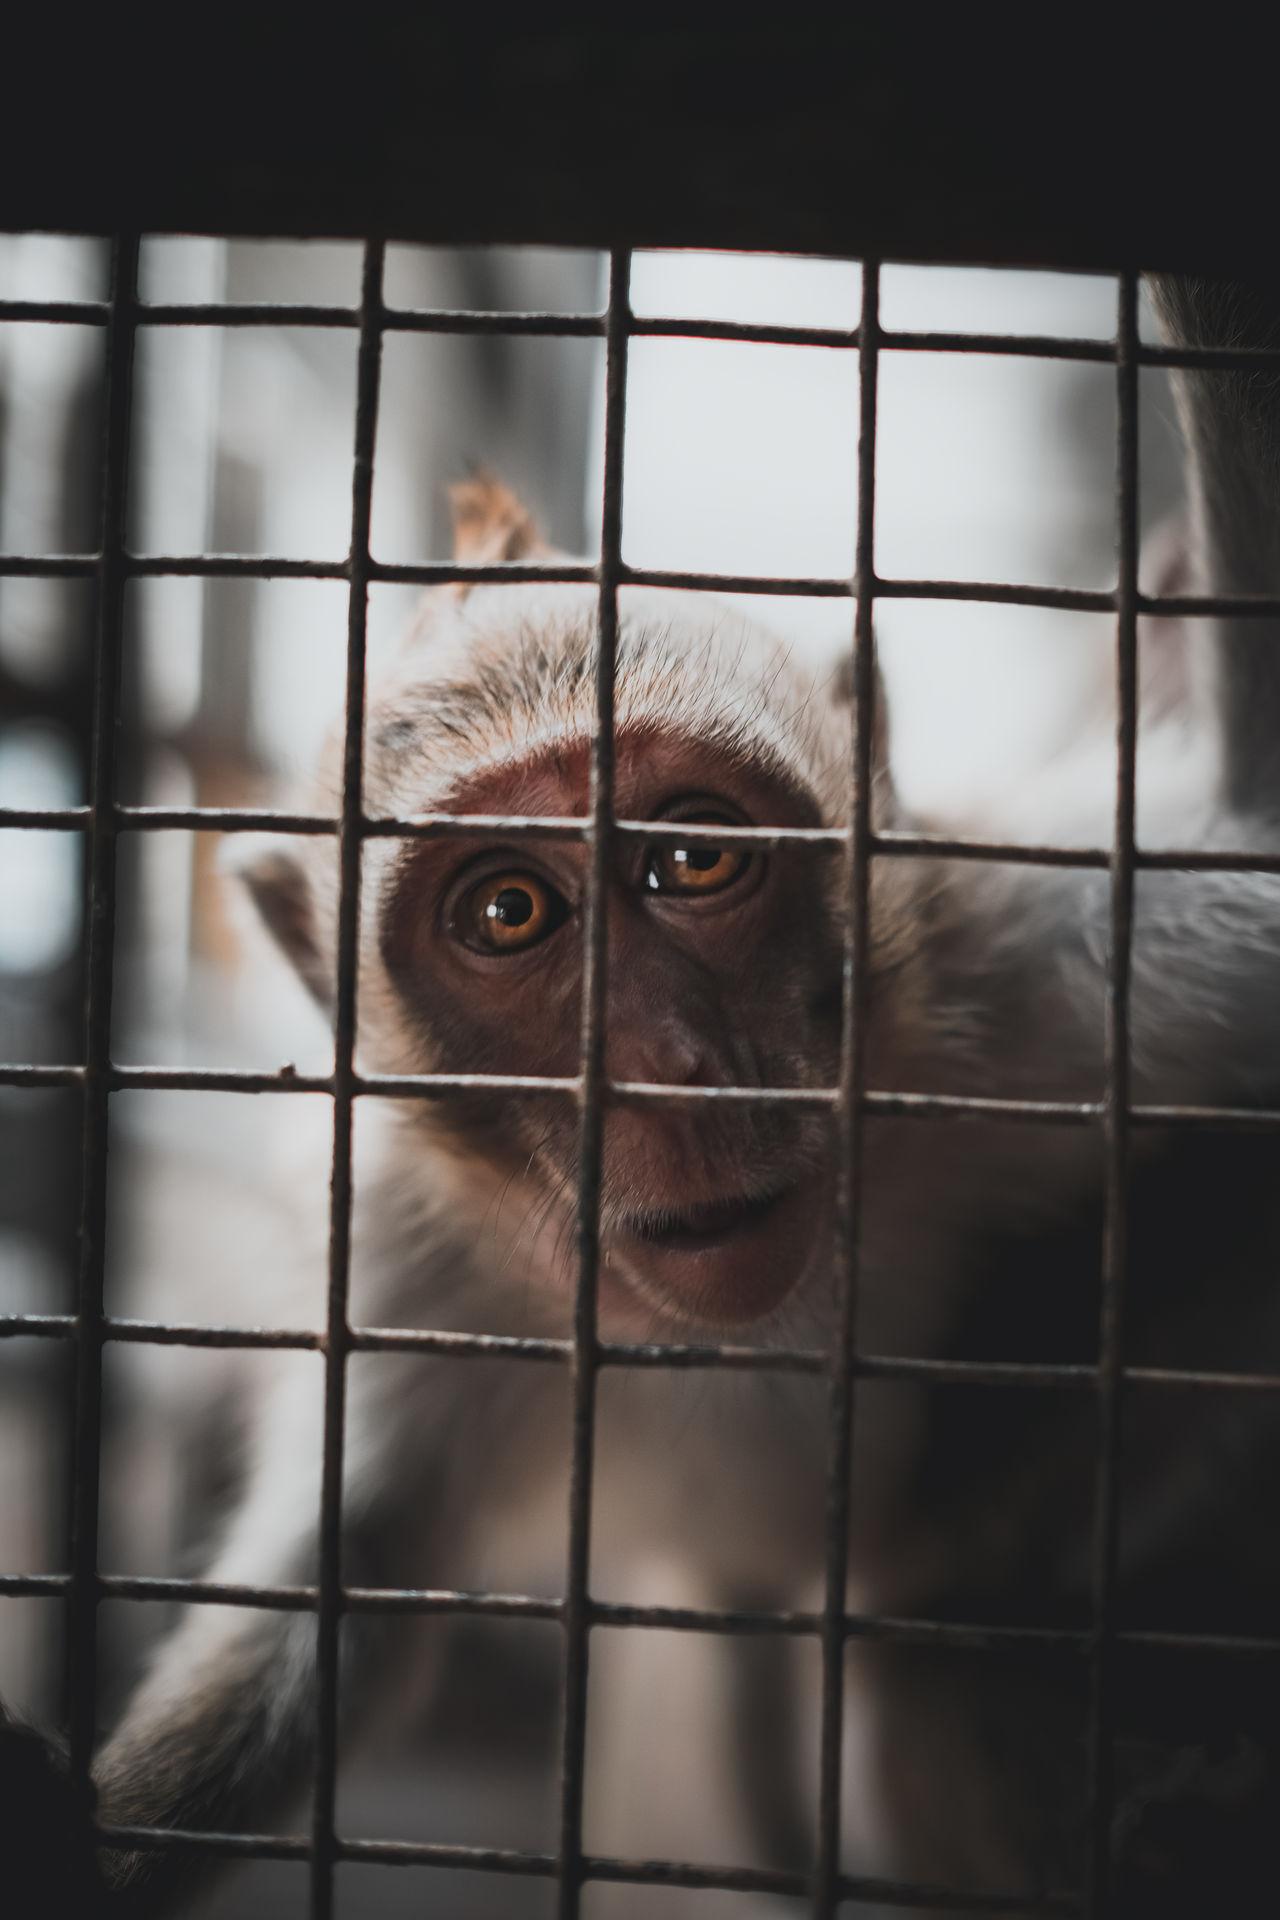 animal themes, animal, mammal, cage, one animal